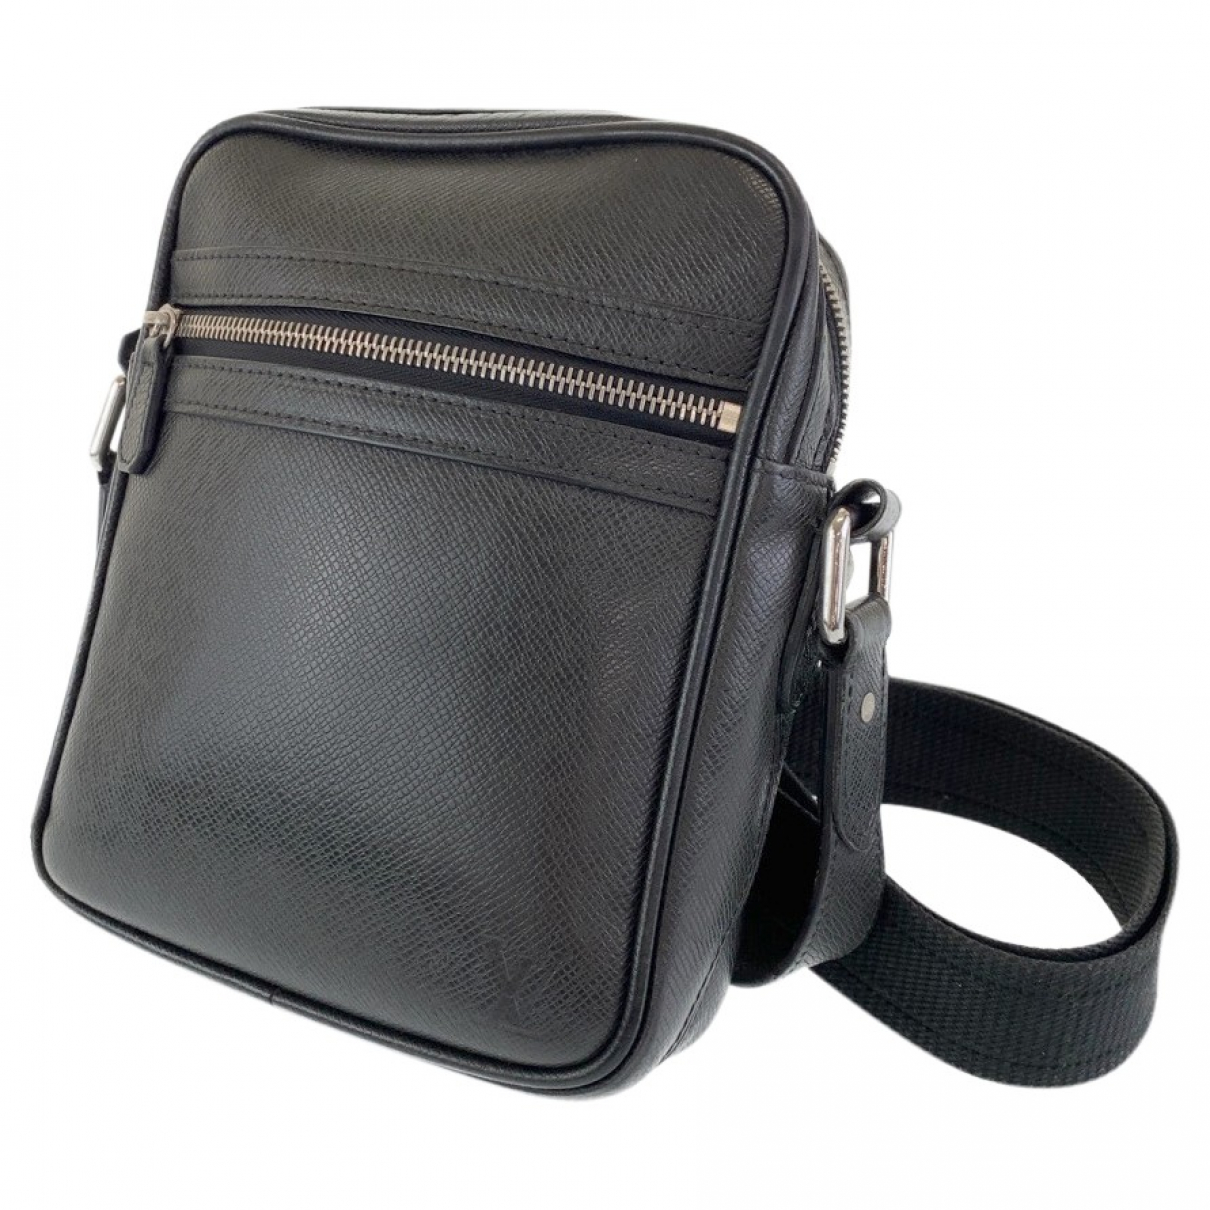 Louis Vuitton \N Leather bag for Men \N